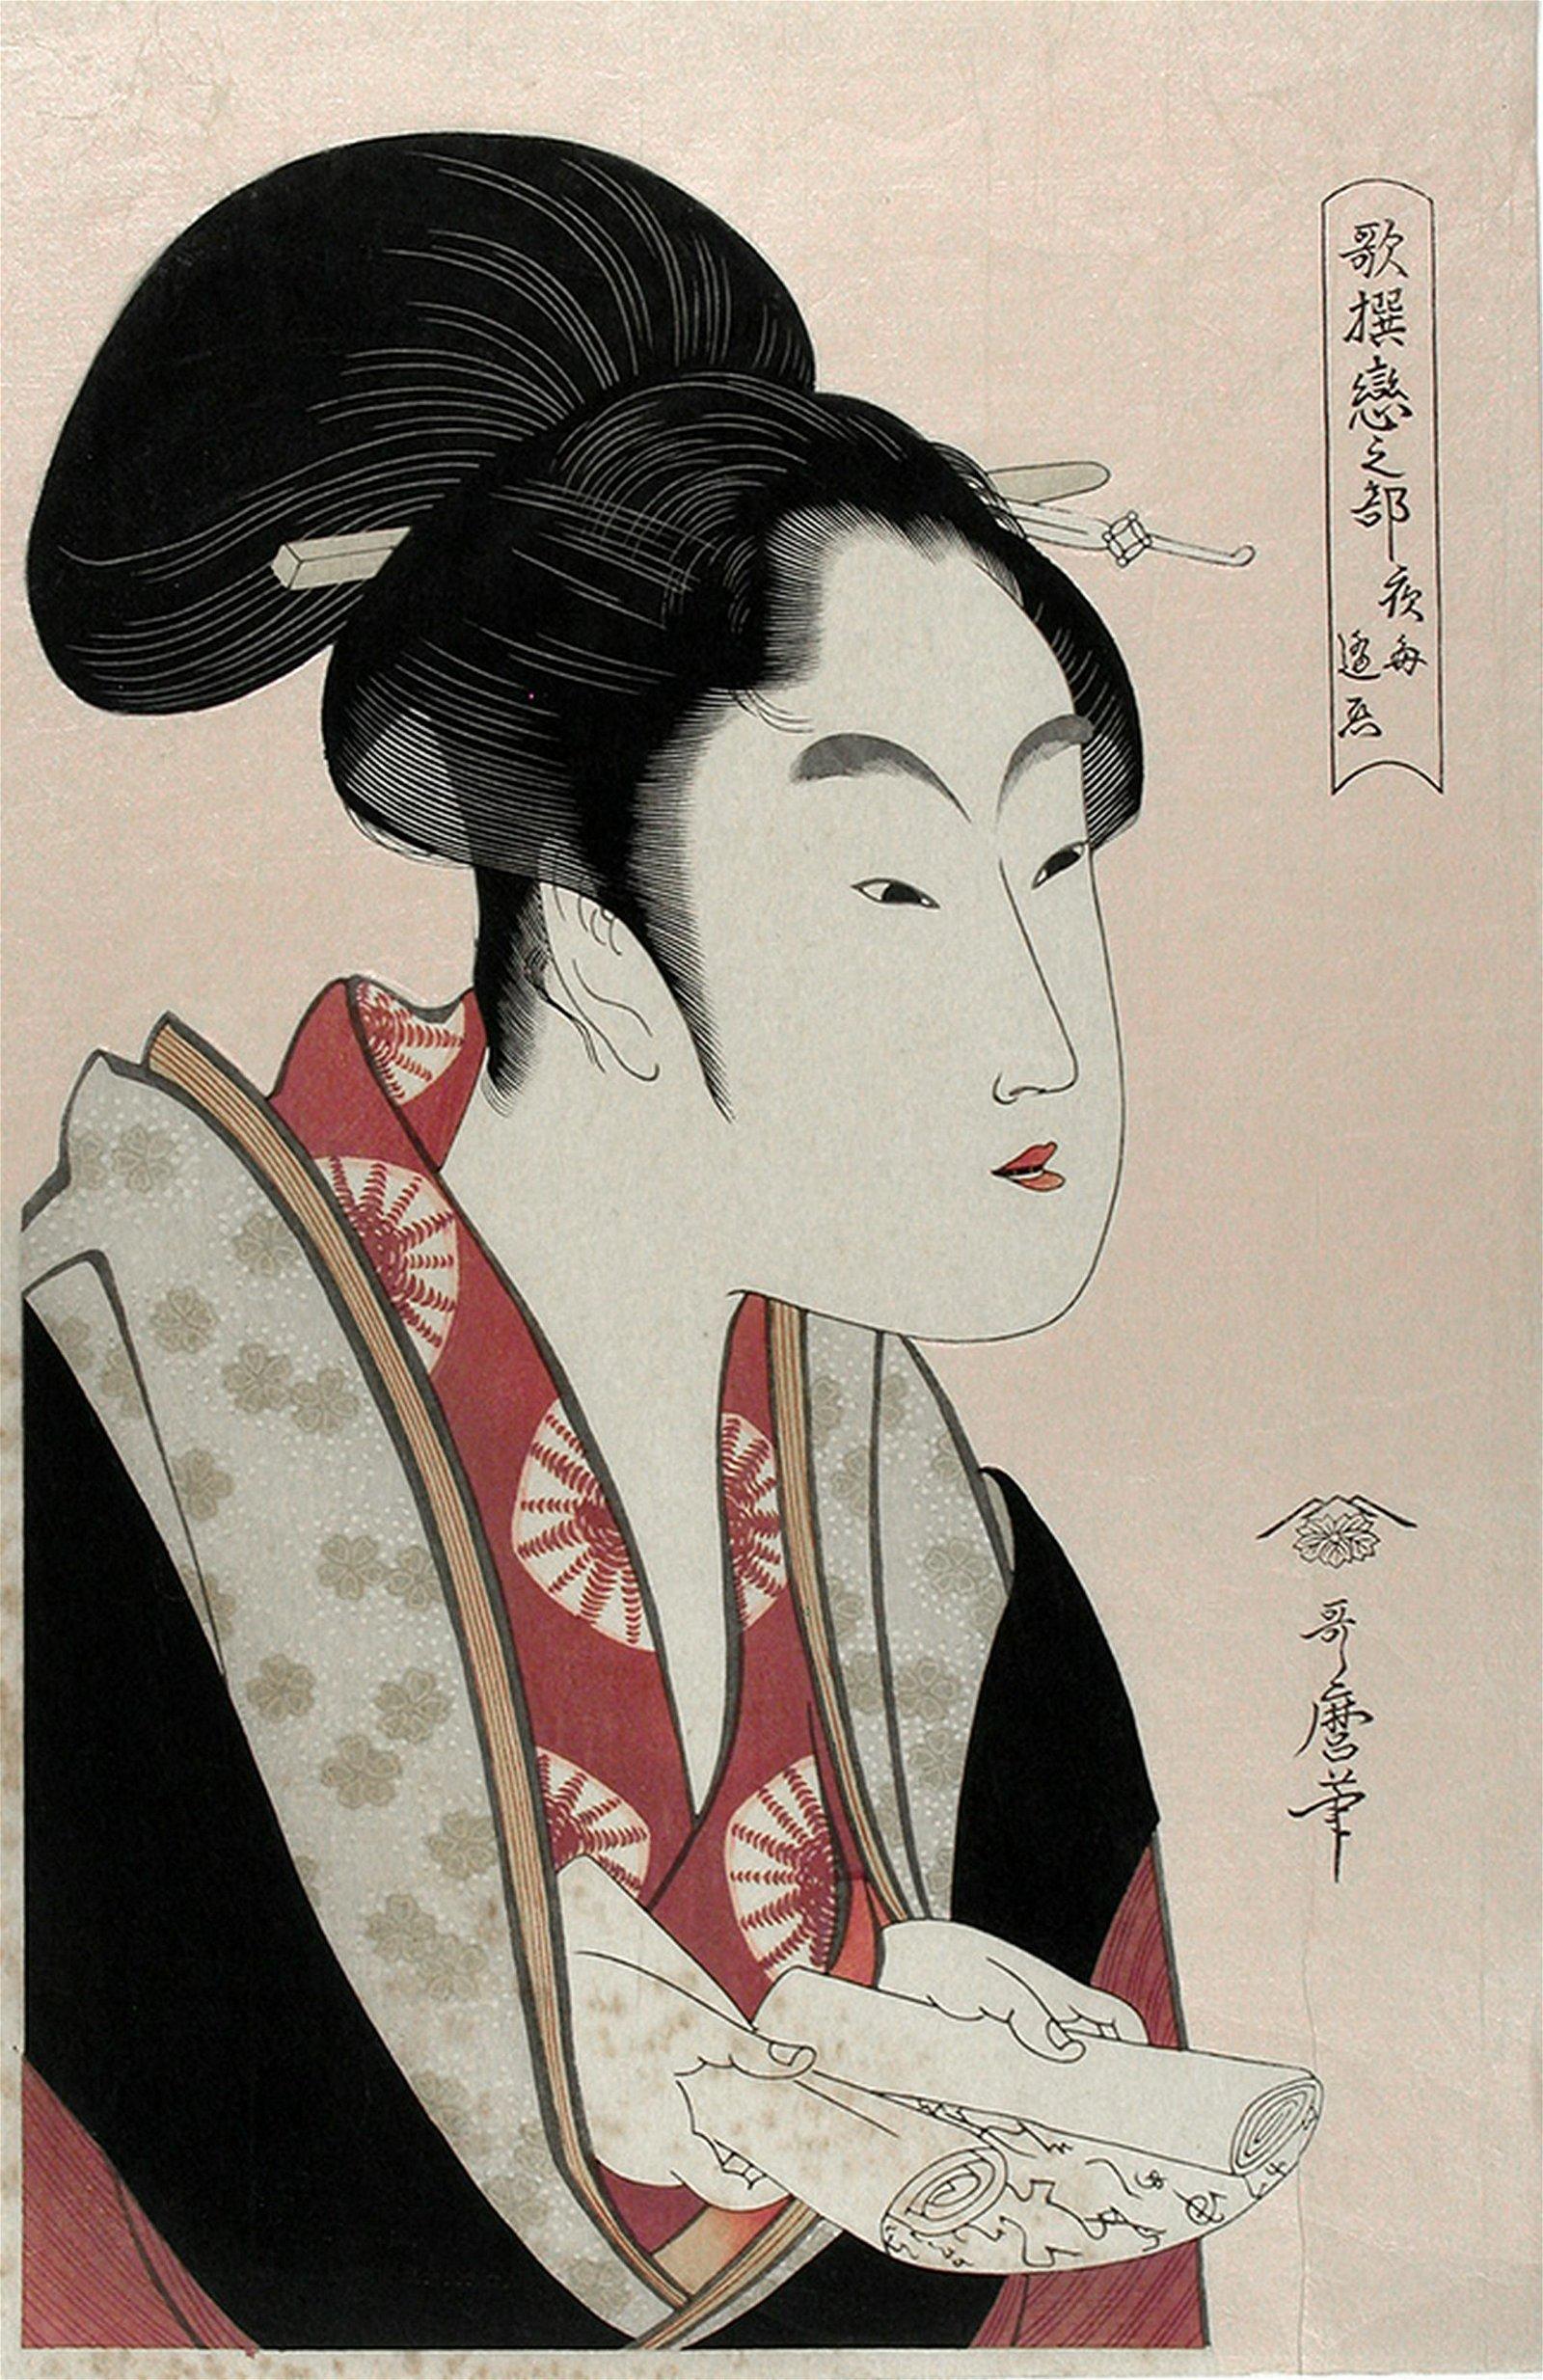 UTAMARO, Kitagawa (1750-1806): Love that meets each